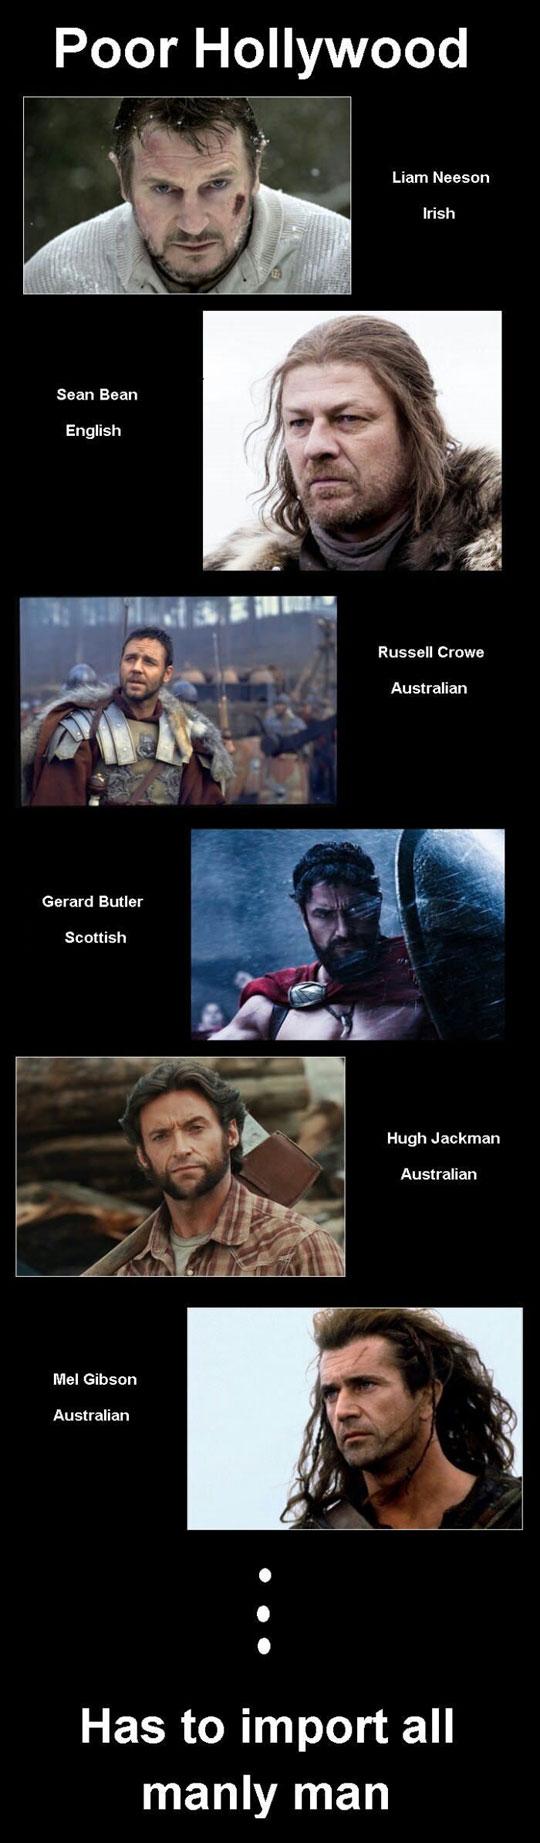 Hollywood Manly Men